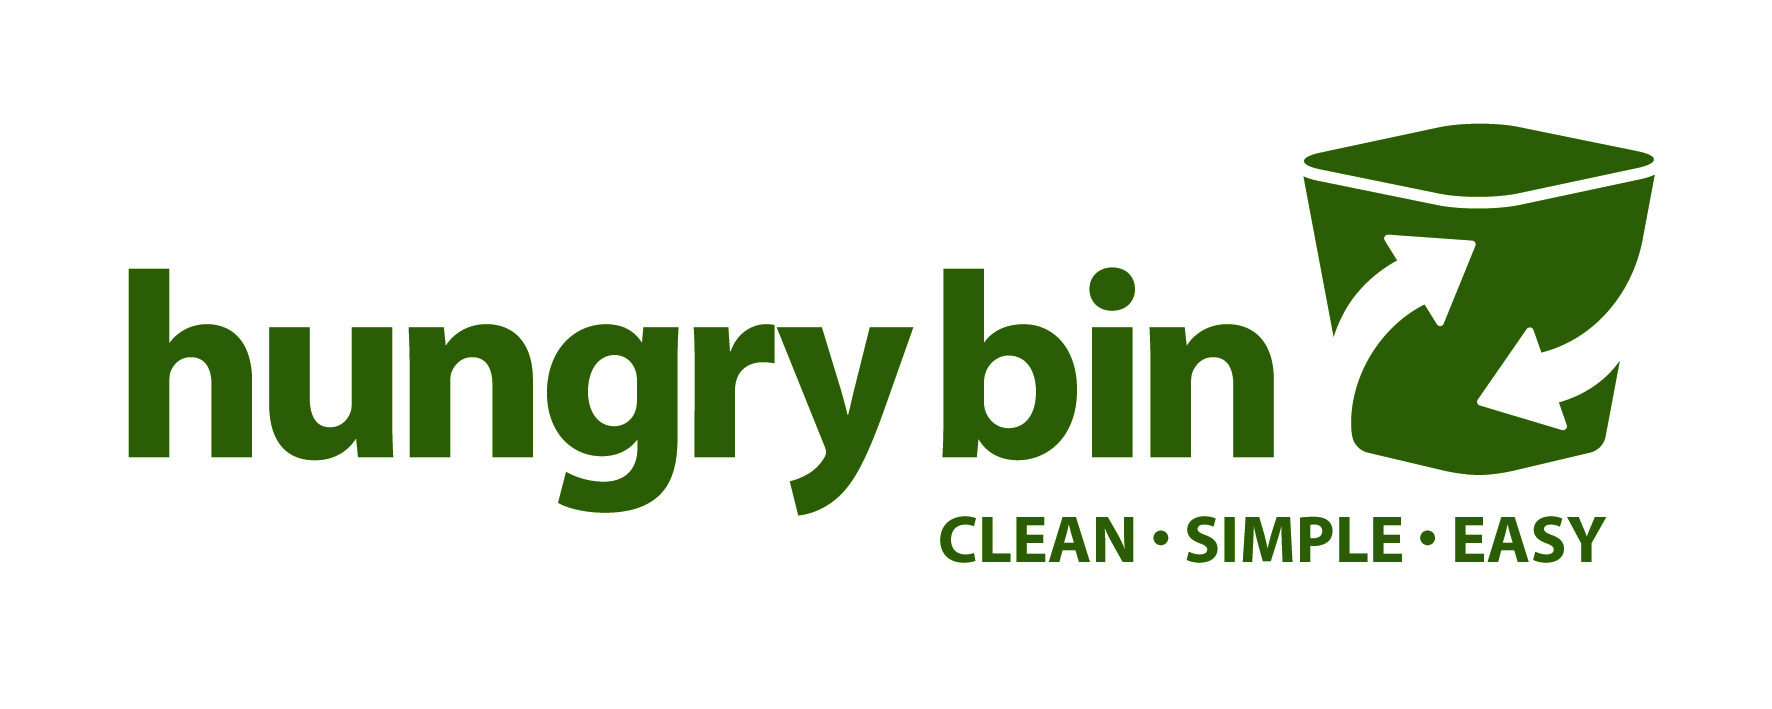 HB_Green_CMYK.jpg